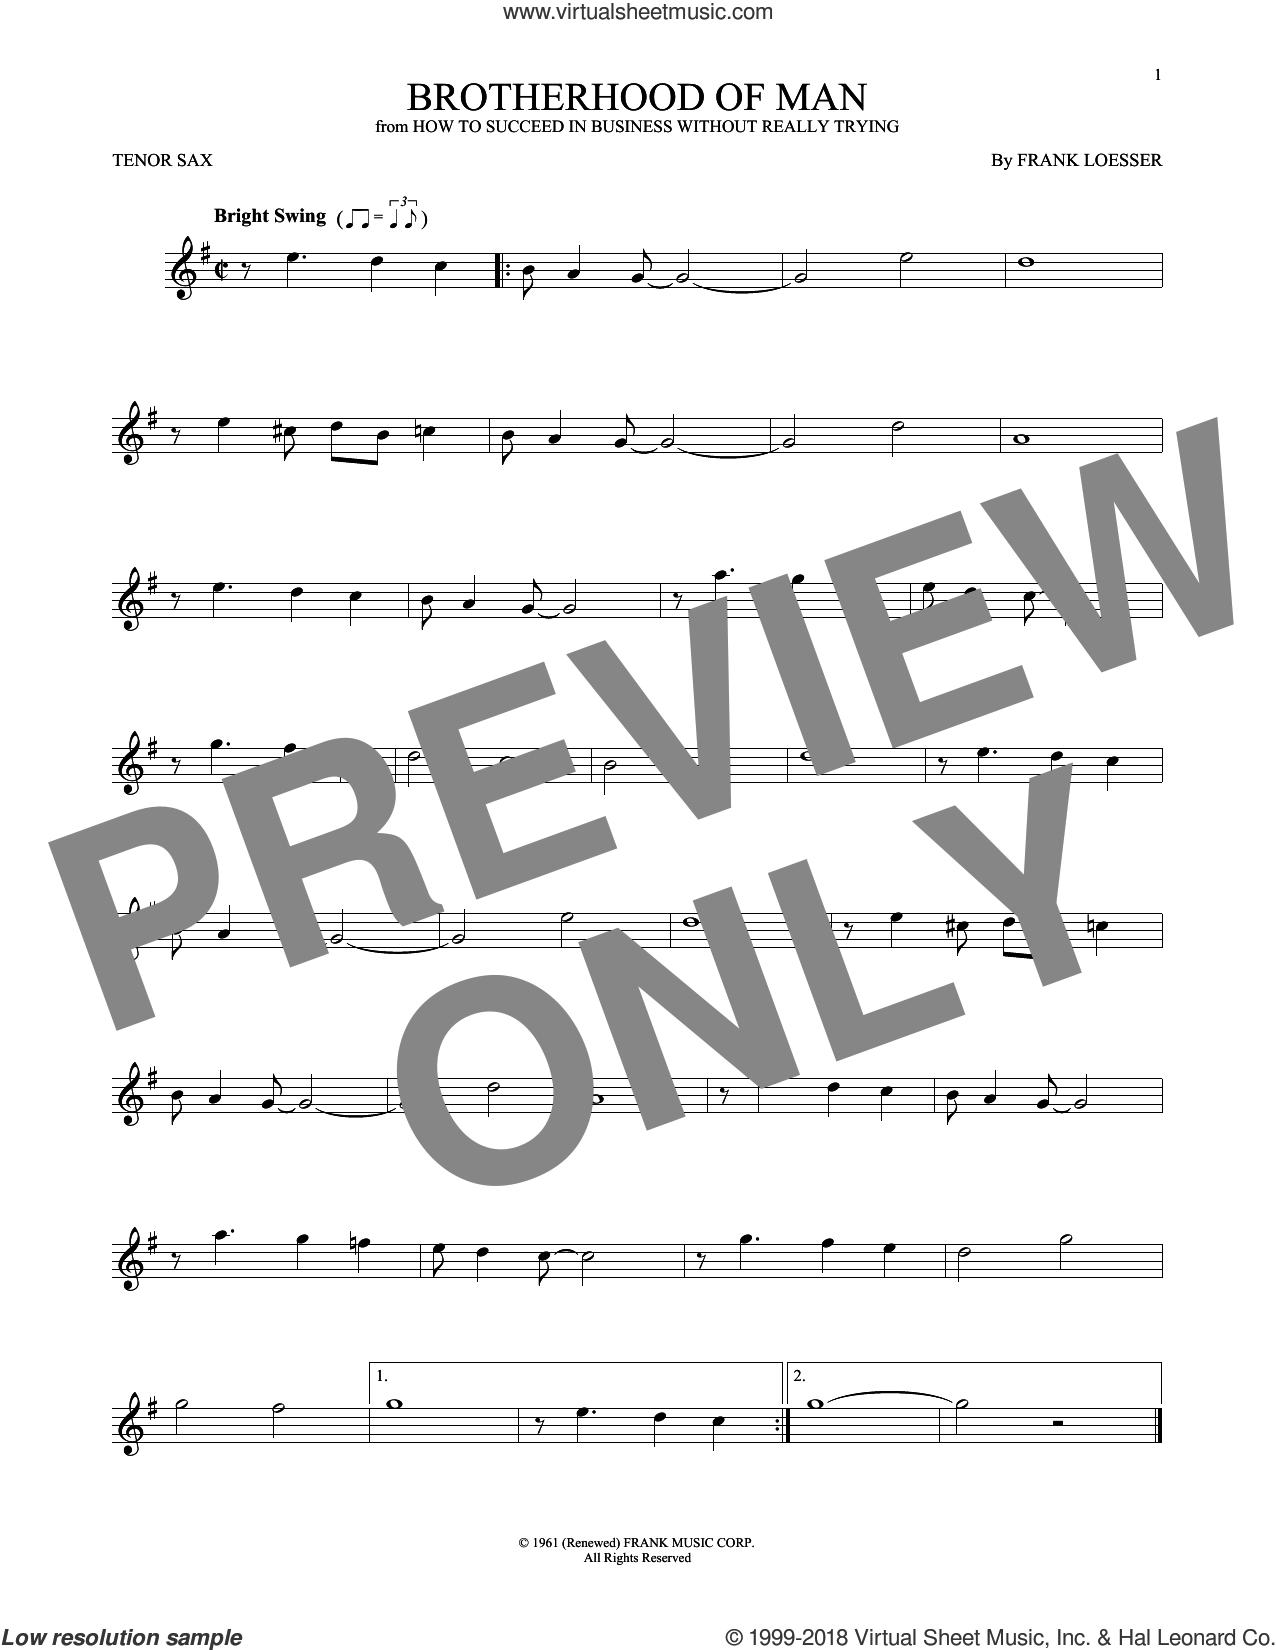 Brotherhood Of Man sheet music for tenor saxophone solo by Frank Loesser, intermediate skill level